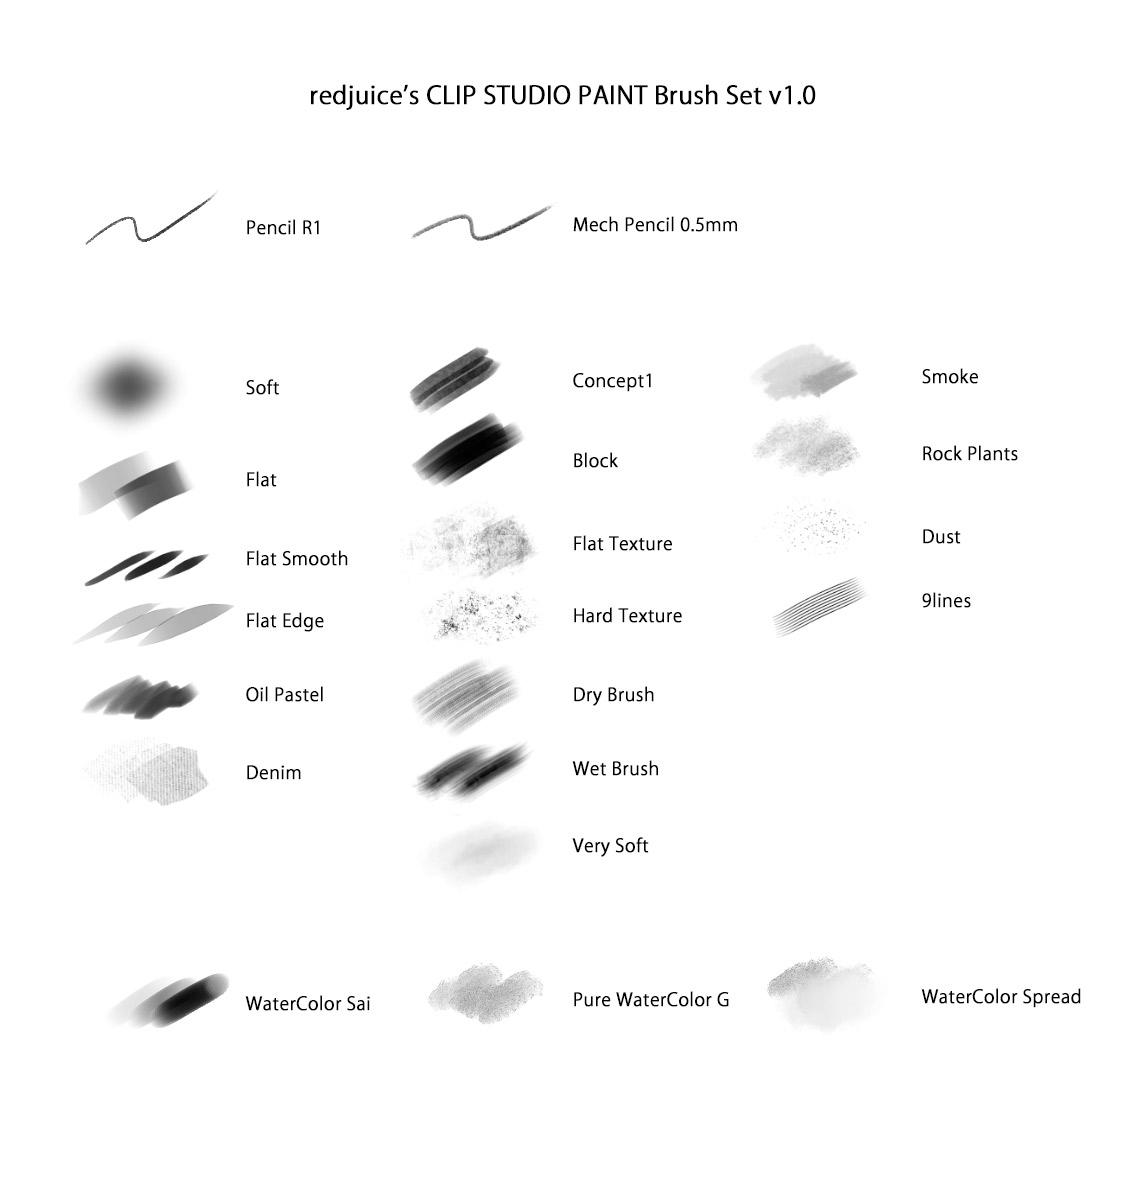 redjuice's Brush Set for CLIP STUDIO PAINT